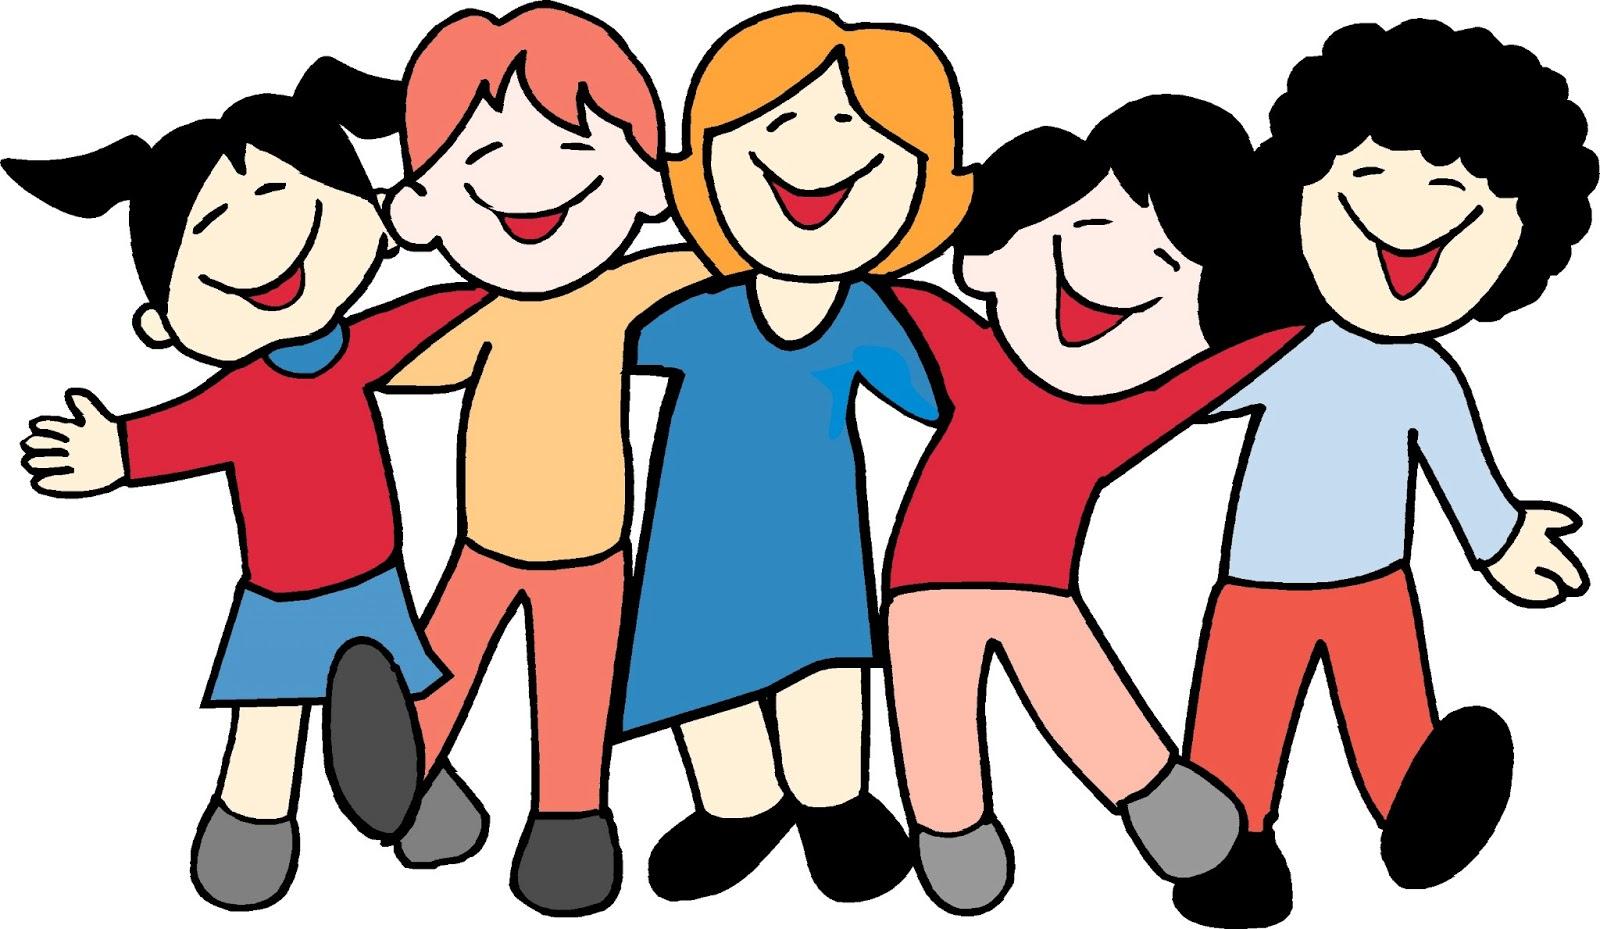 Friendship clip art free clipart images 2